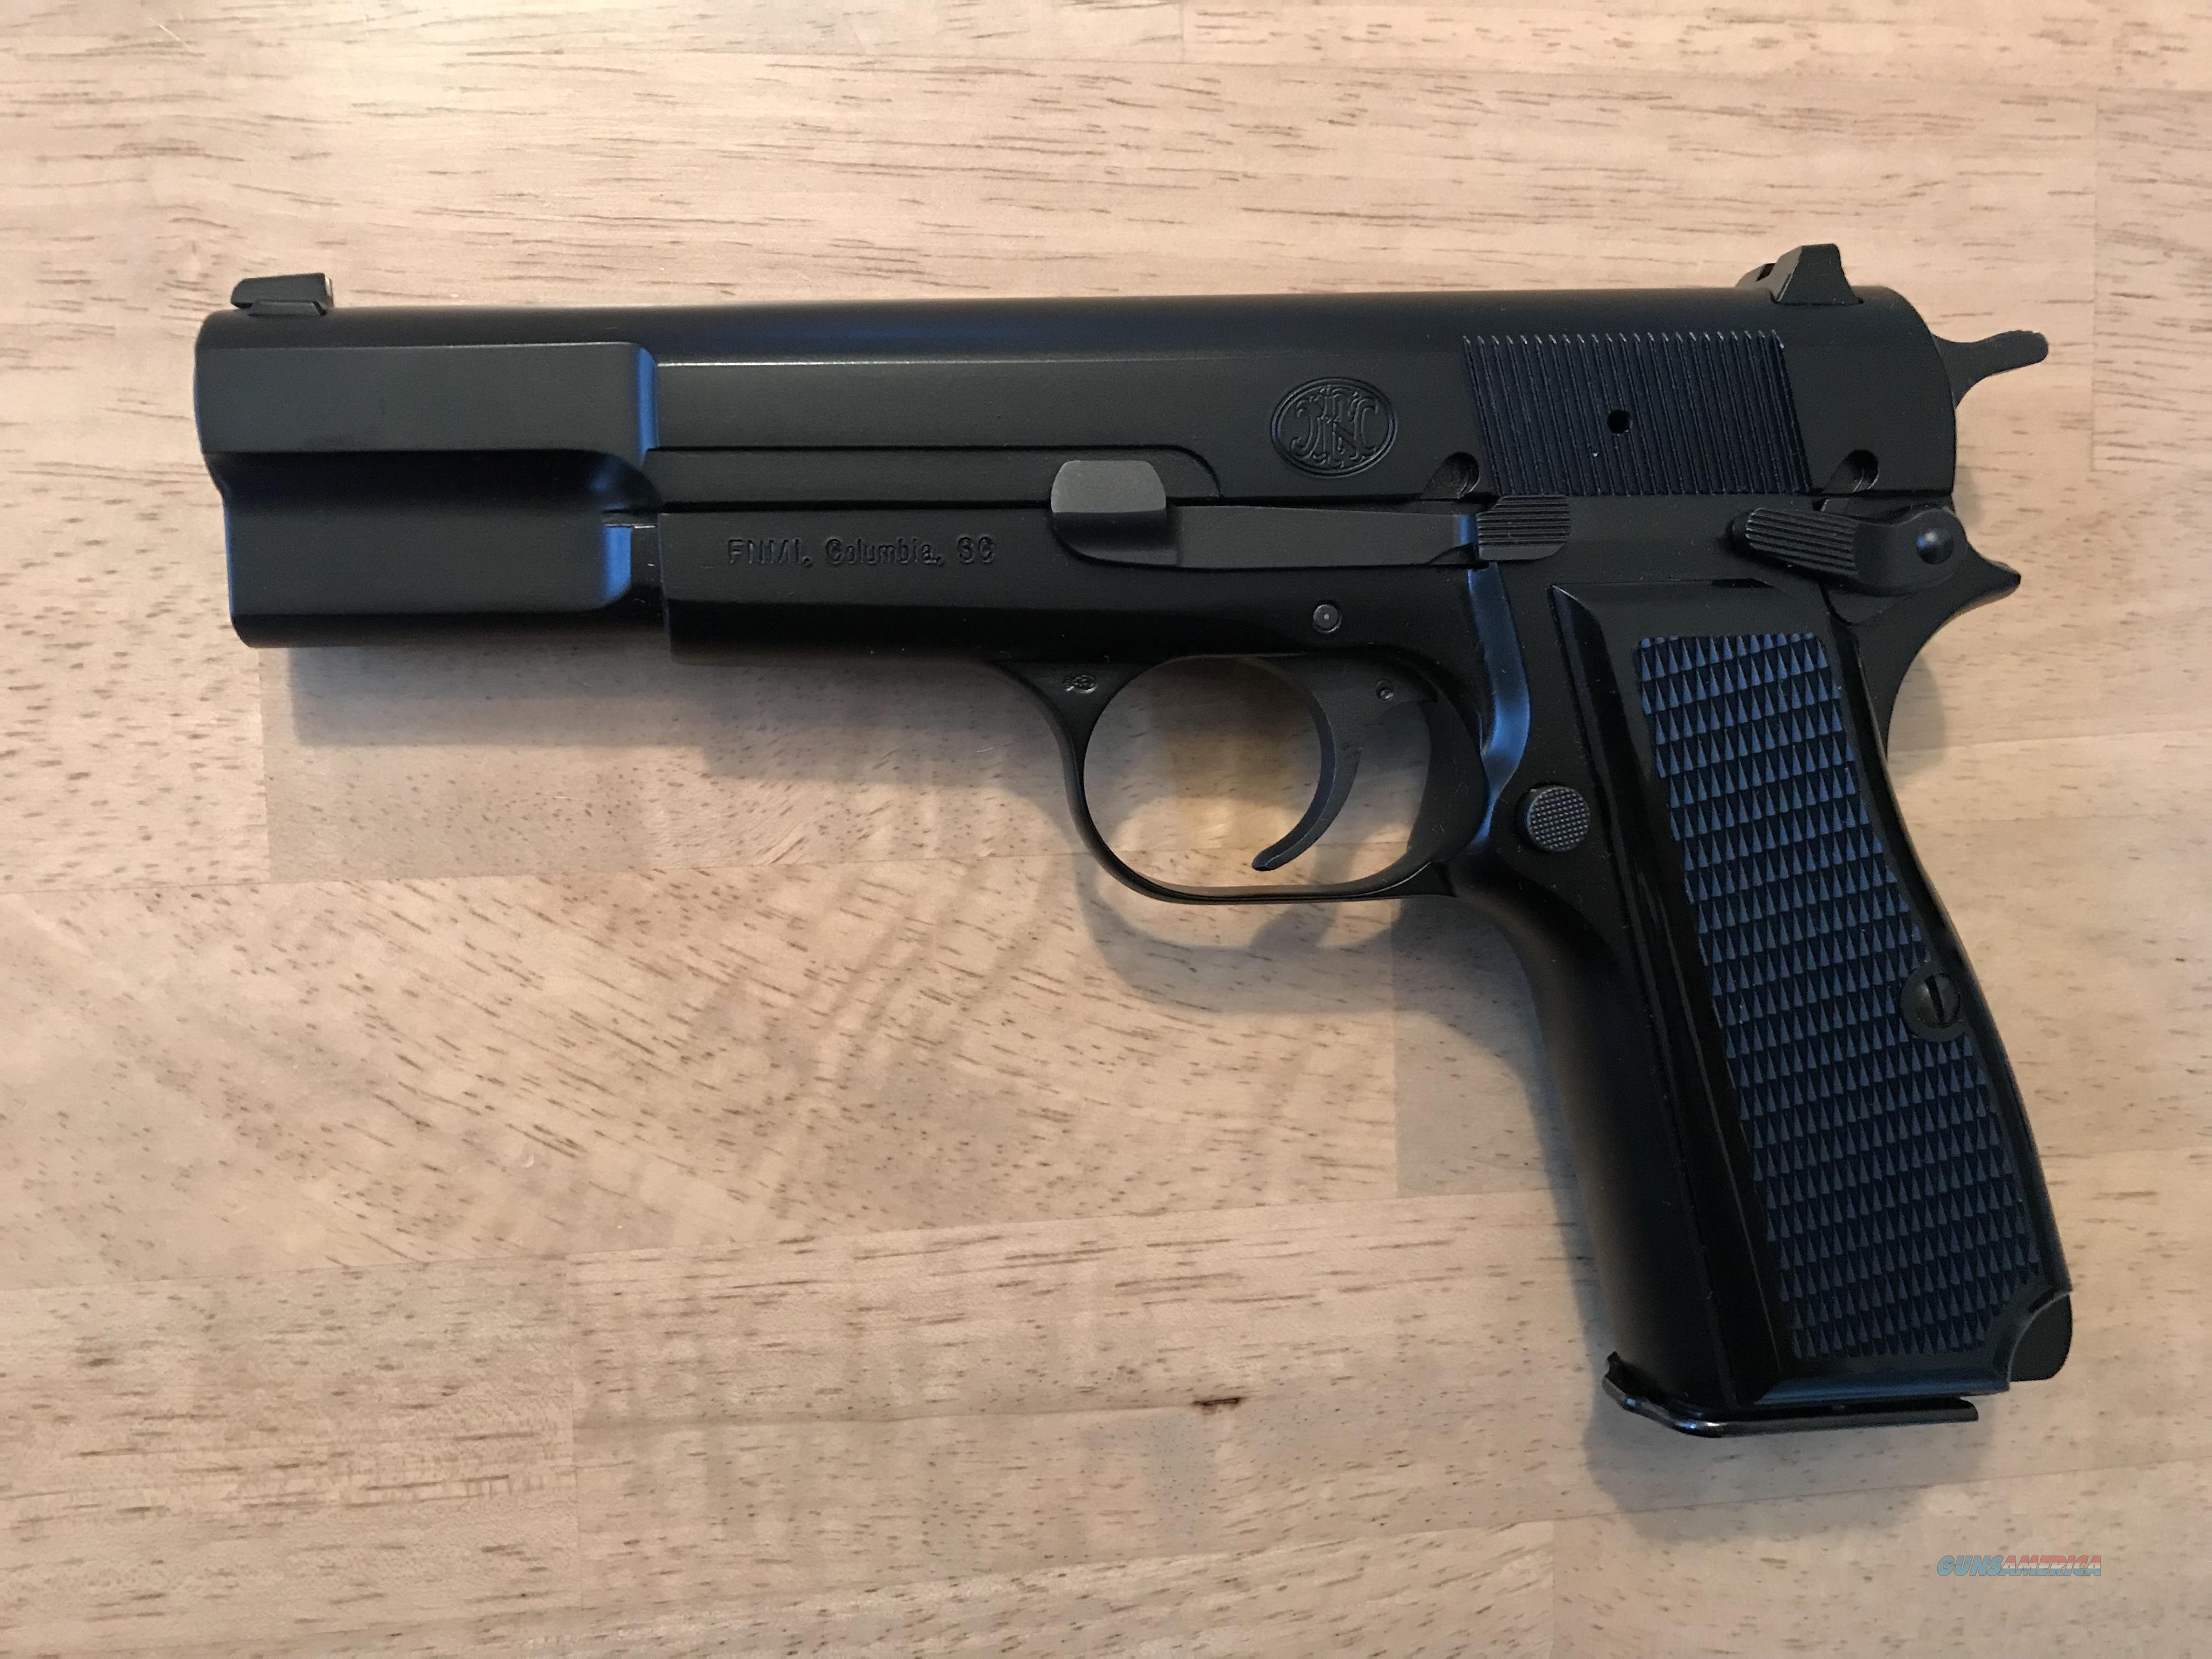 Hi-Power FN Herstal Hi Power .40 S&W 2003 Belgium Unfired NIB - Collector Grade  Guns > Pistols > FNH - Fabrique Nationale (FN) Pistols > High Power Type